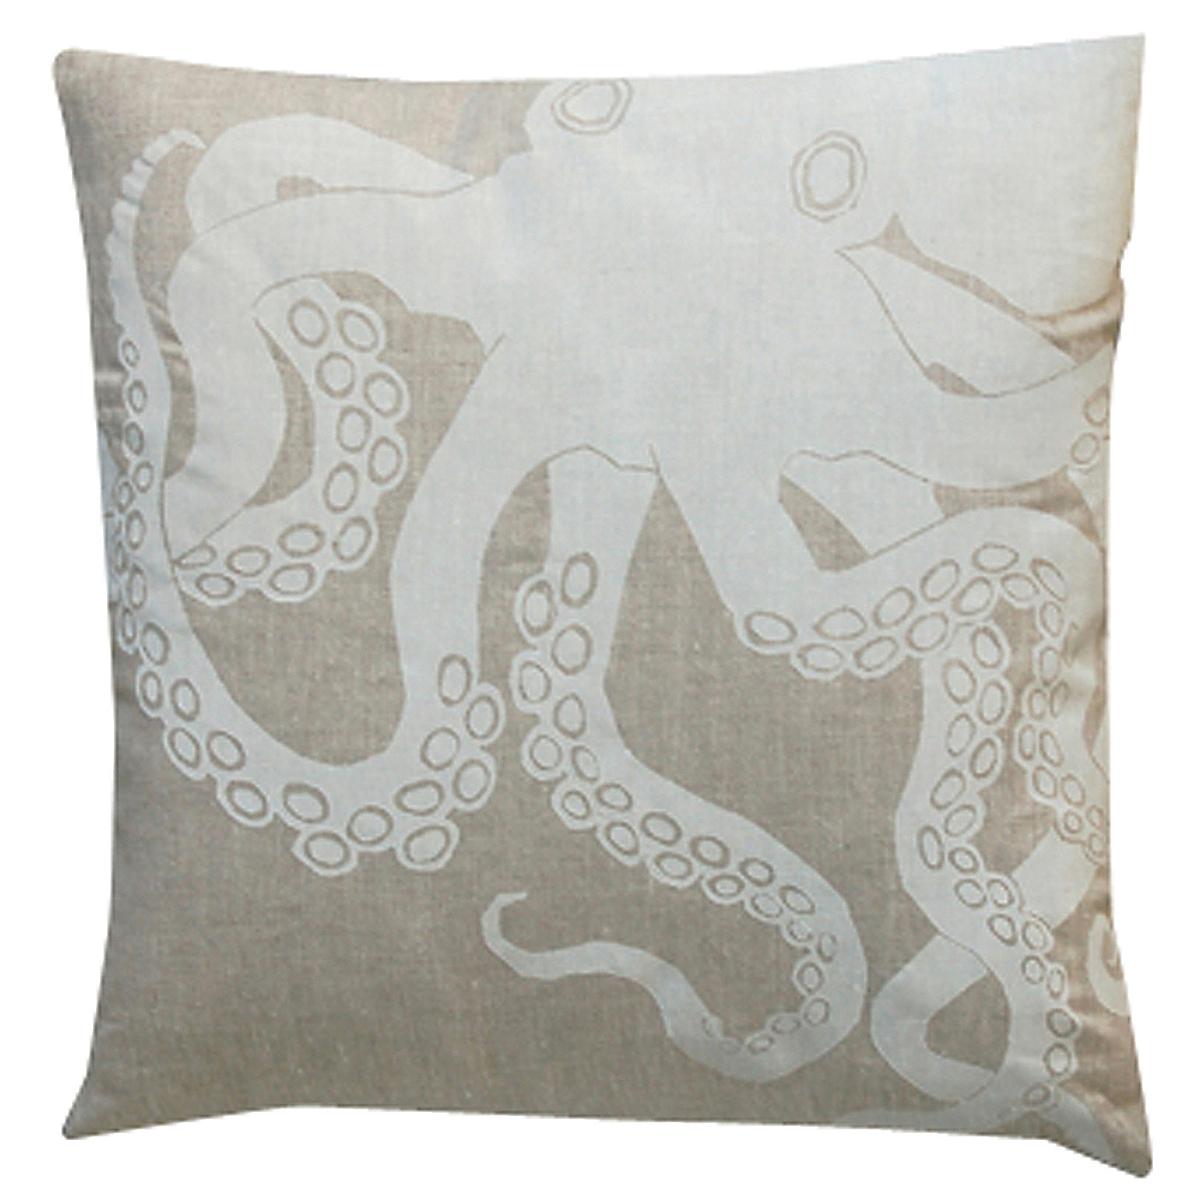 "20"" x 20"" - Octopus Pillow: White on Natural Linen"